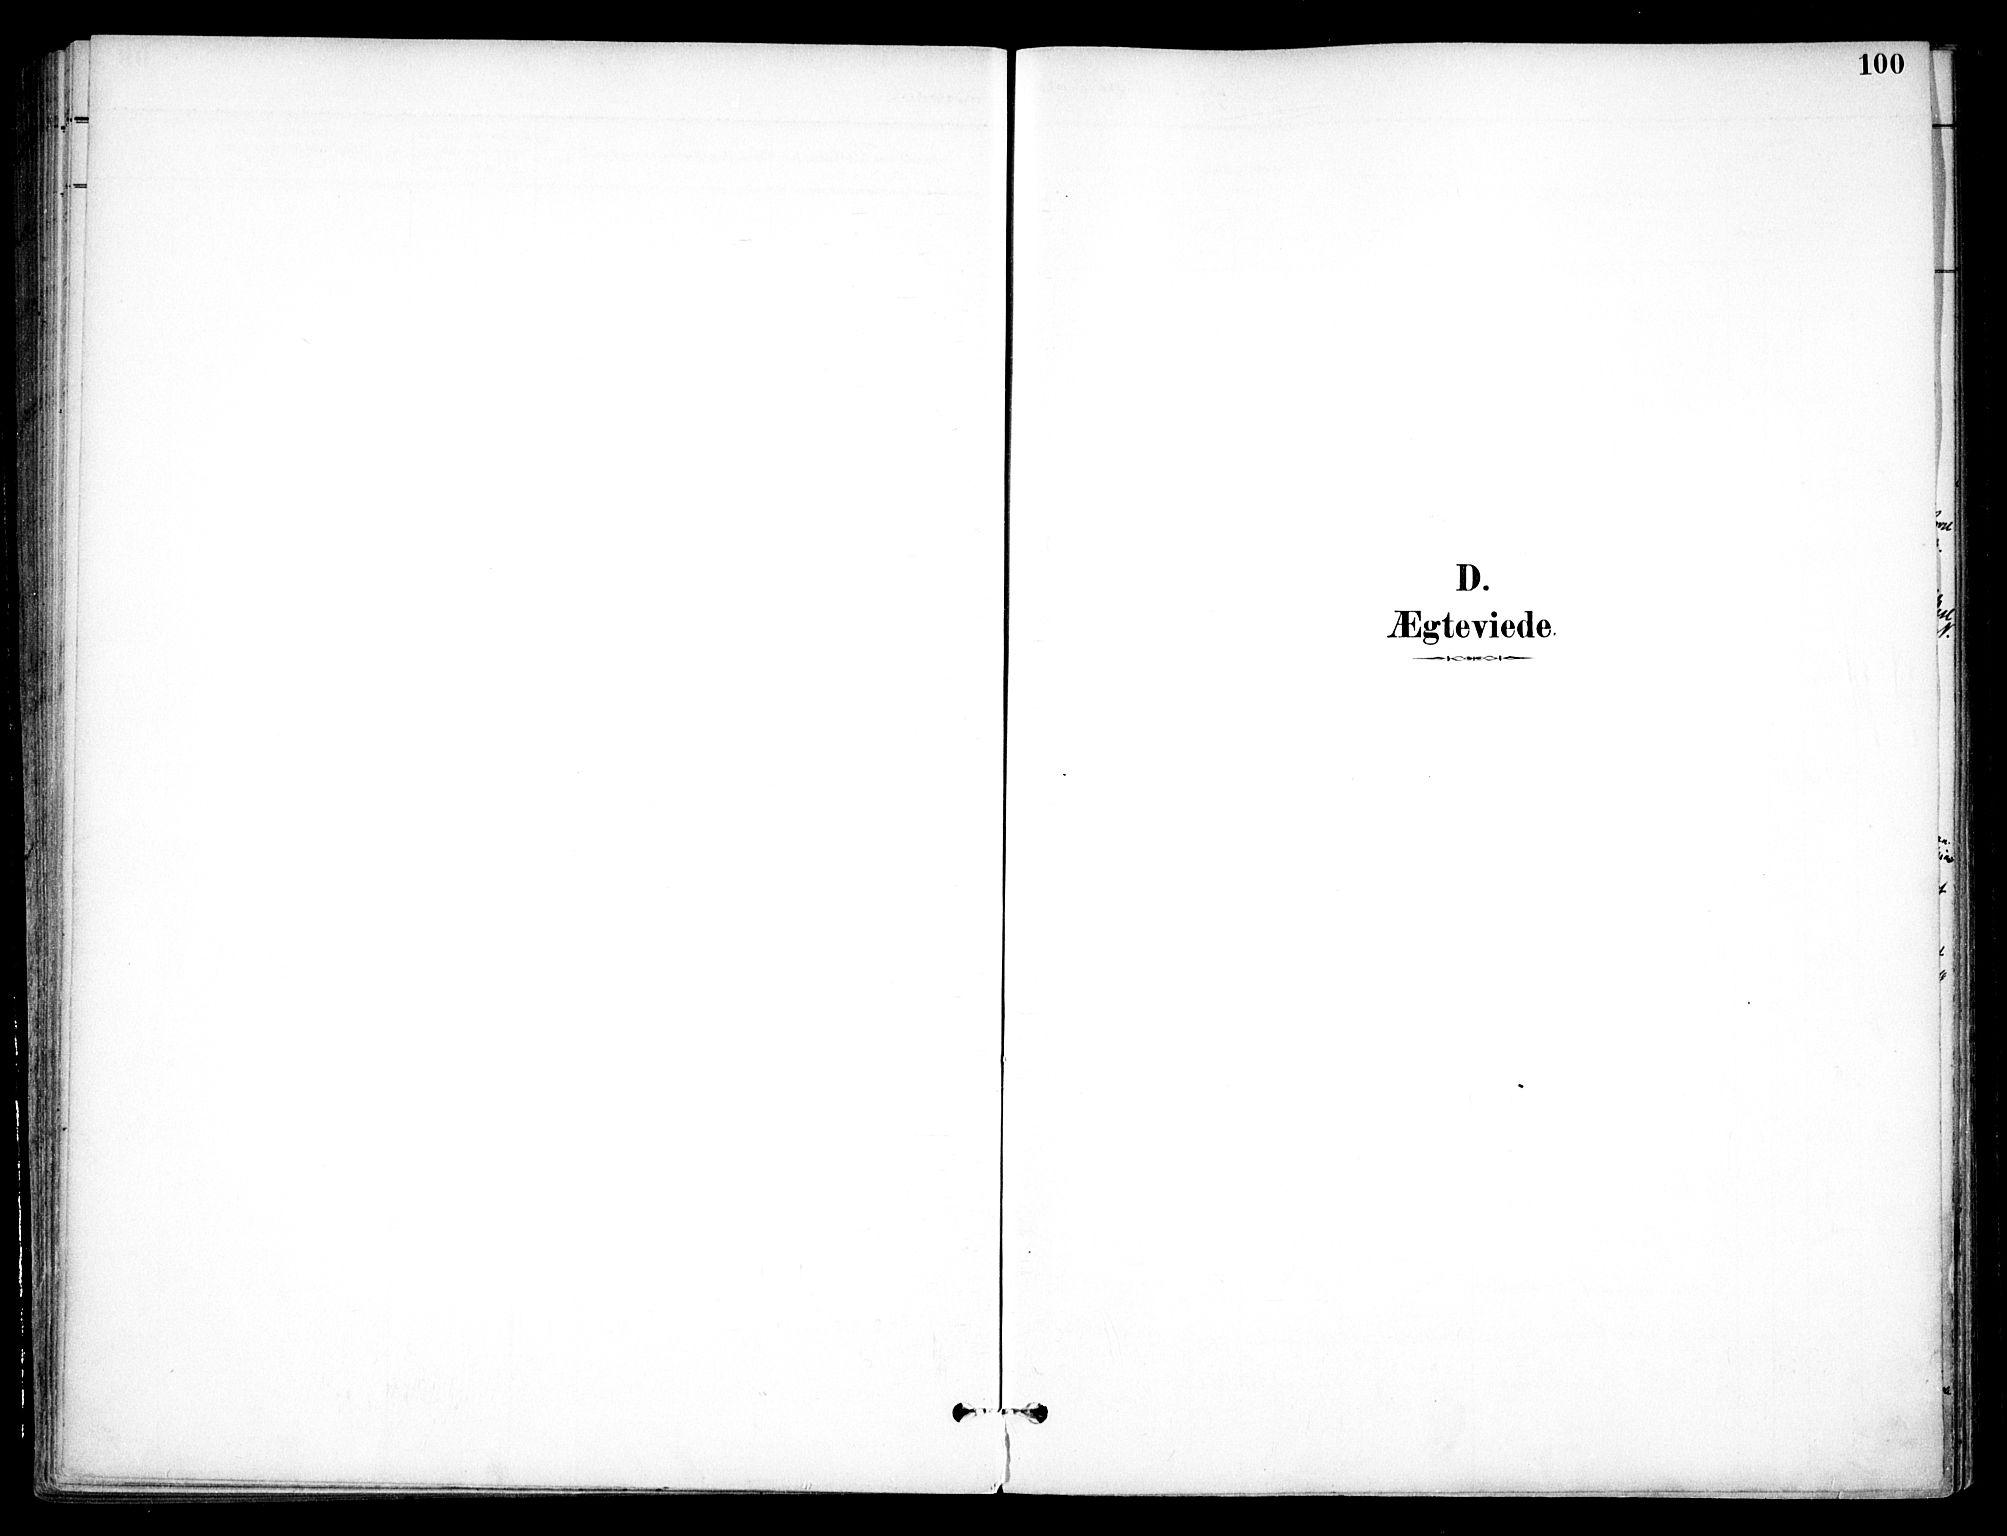 SAO, Nannestad prestekontor Kirkebøker, F/Fc/L0002: Ministerialbok nr. III 2, 1893-1907, s. 100